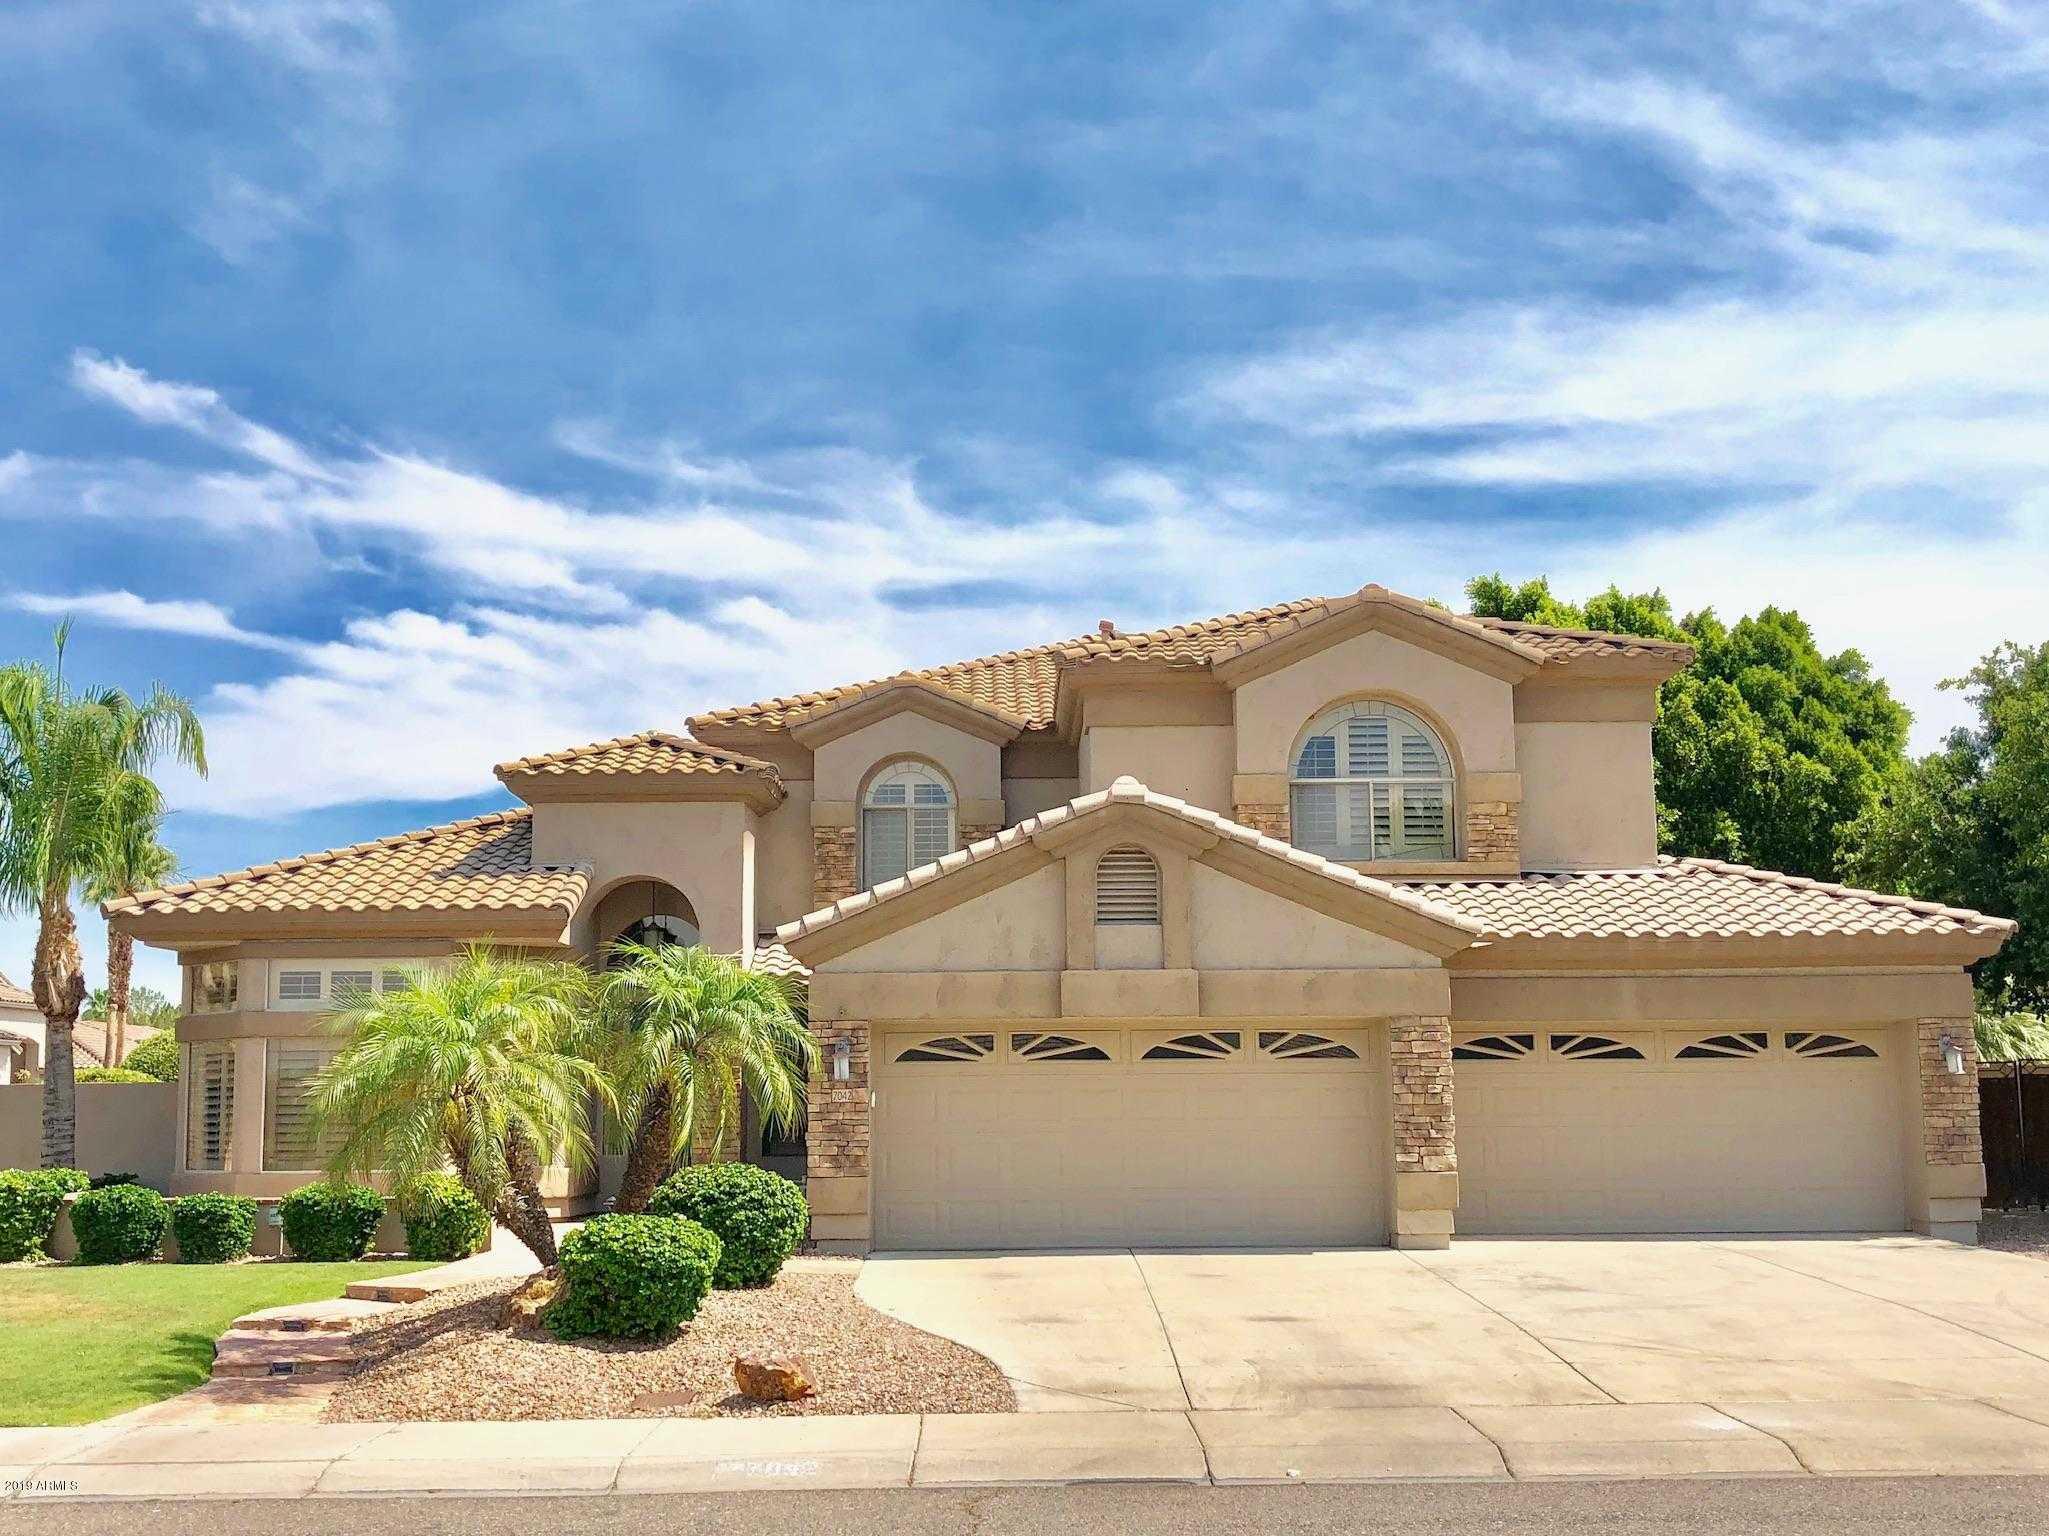 $620,000 - 5Br/3Ba - Home for Sale in Sierra Verde Parcel C, Glendale